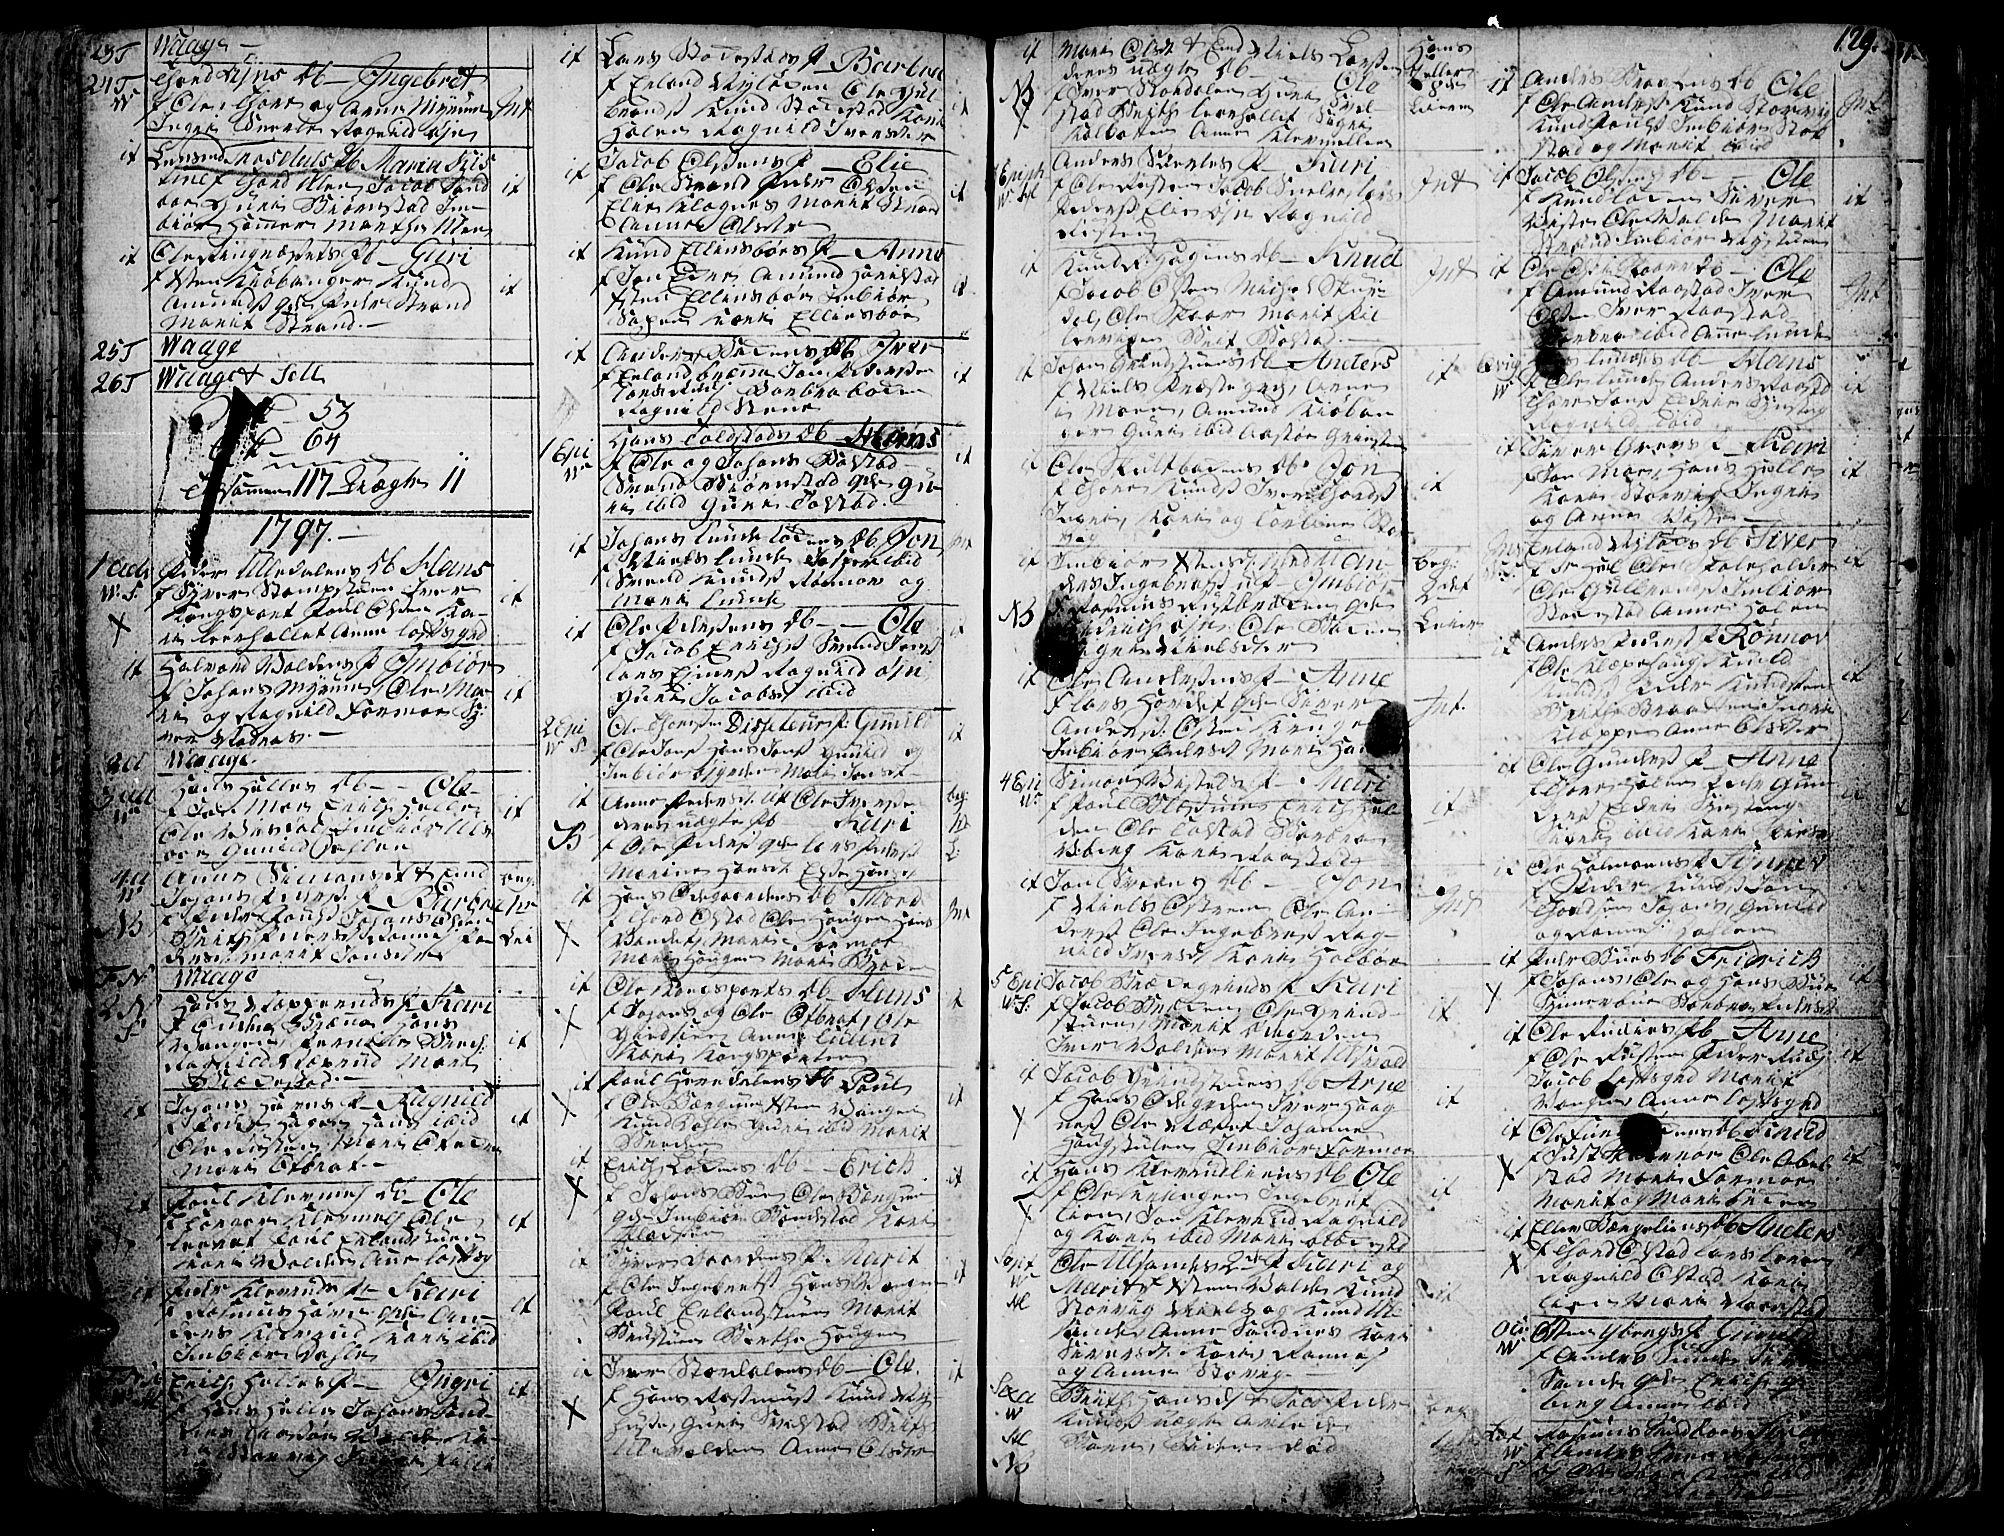 SAH, Vågå prestekontor, Ministerialbok nr. 1, 1739-1810, s. 129